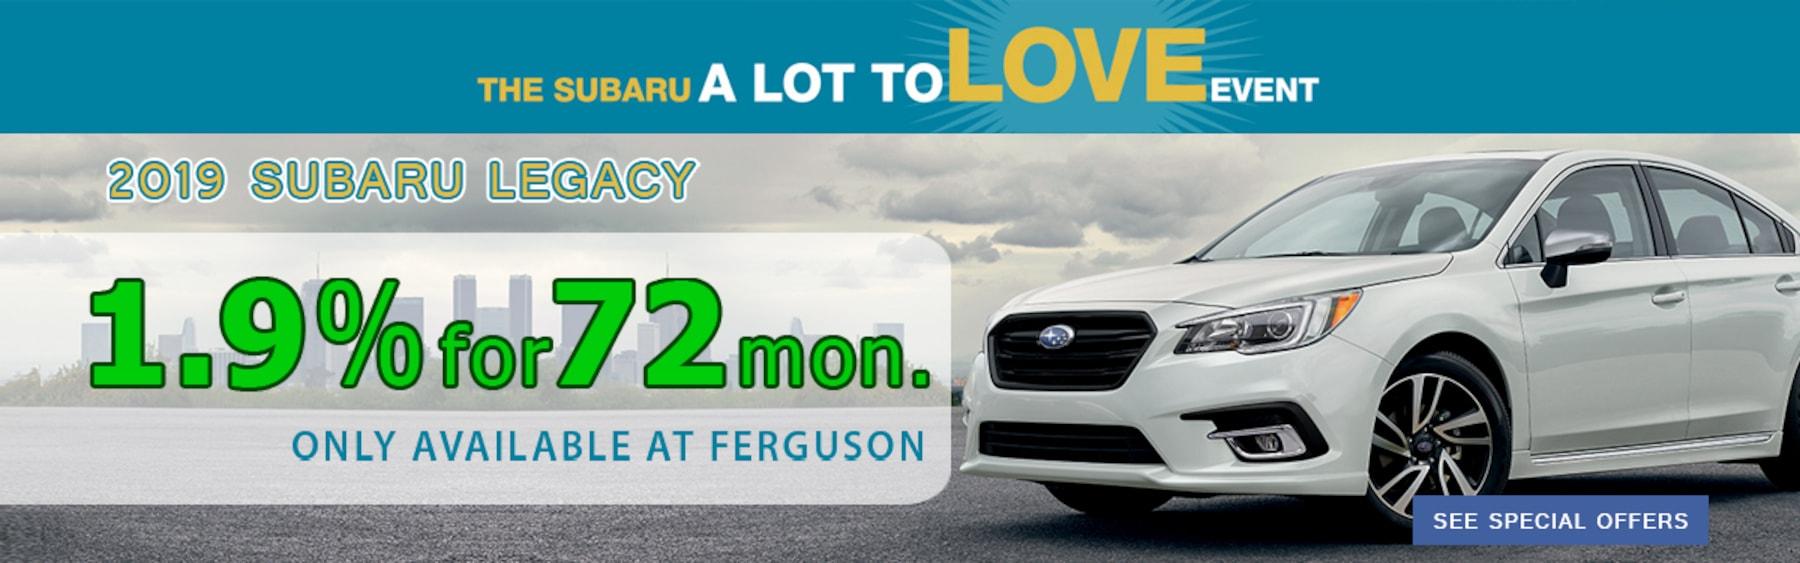 Ferguson Subaru | New & Used Subaru Sales in Broken Arrow, OK